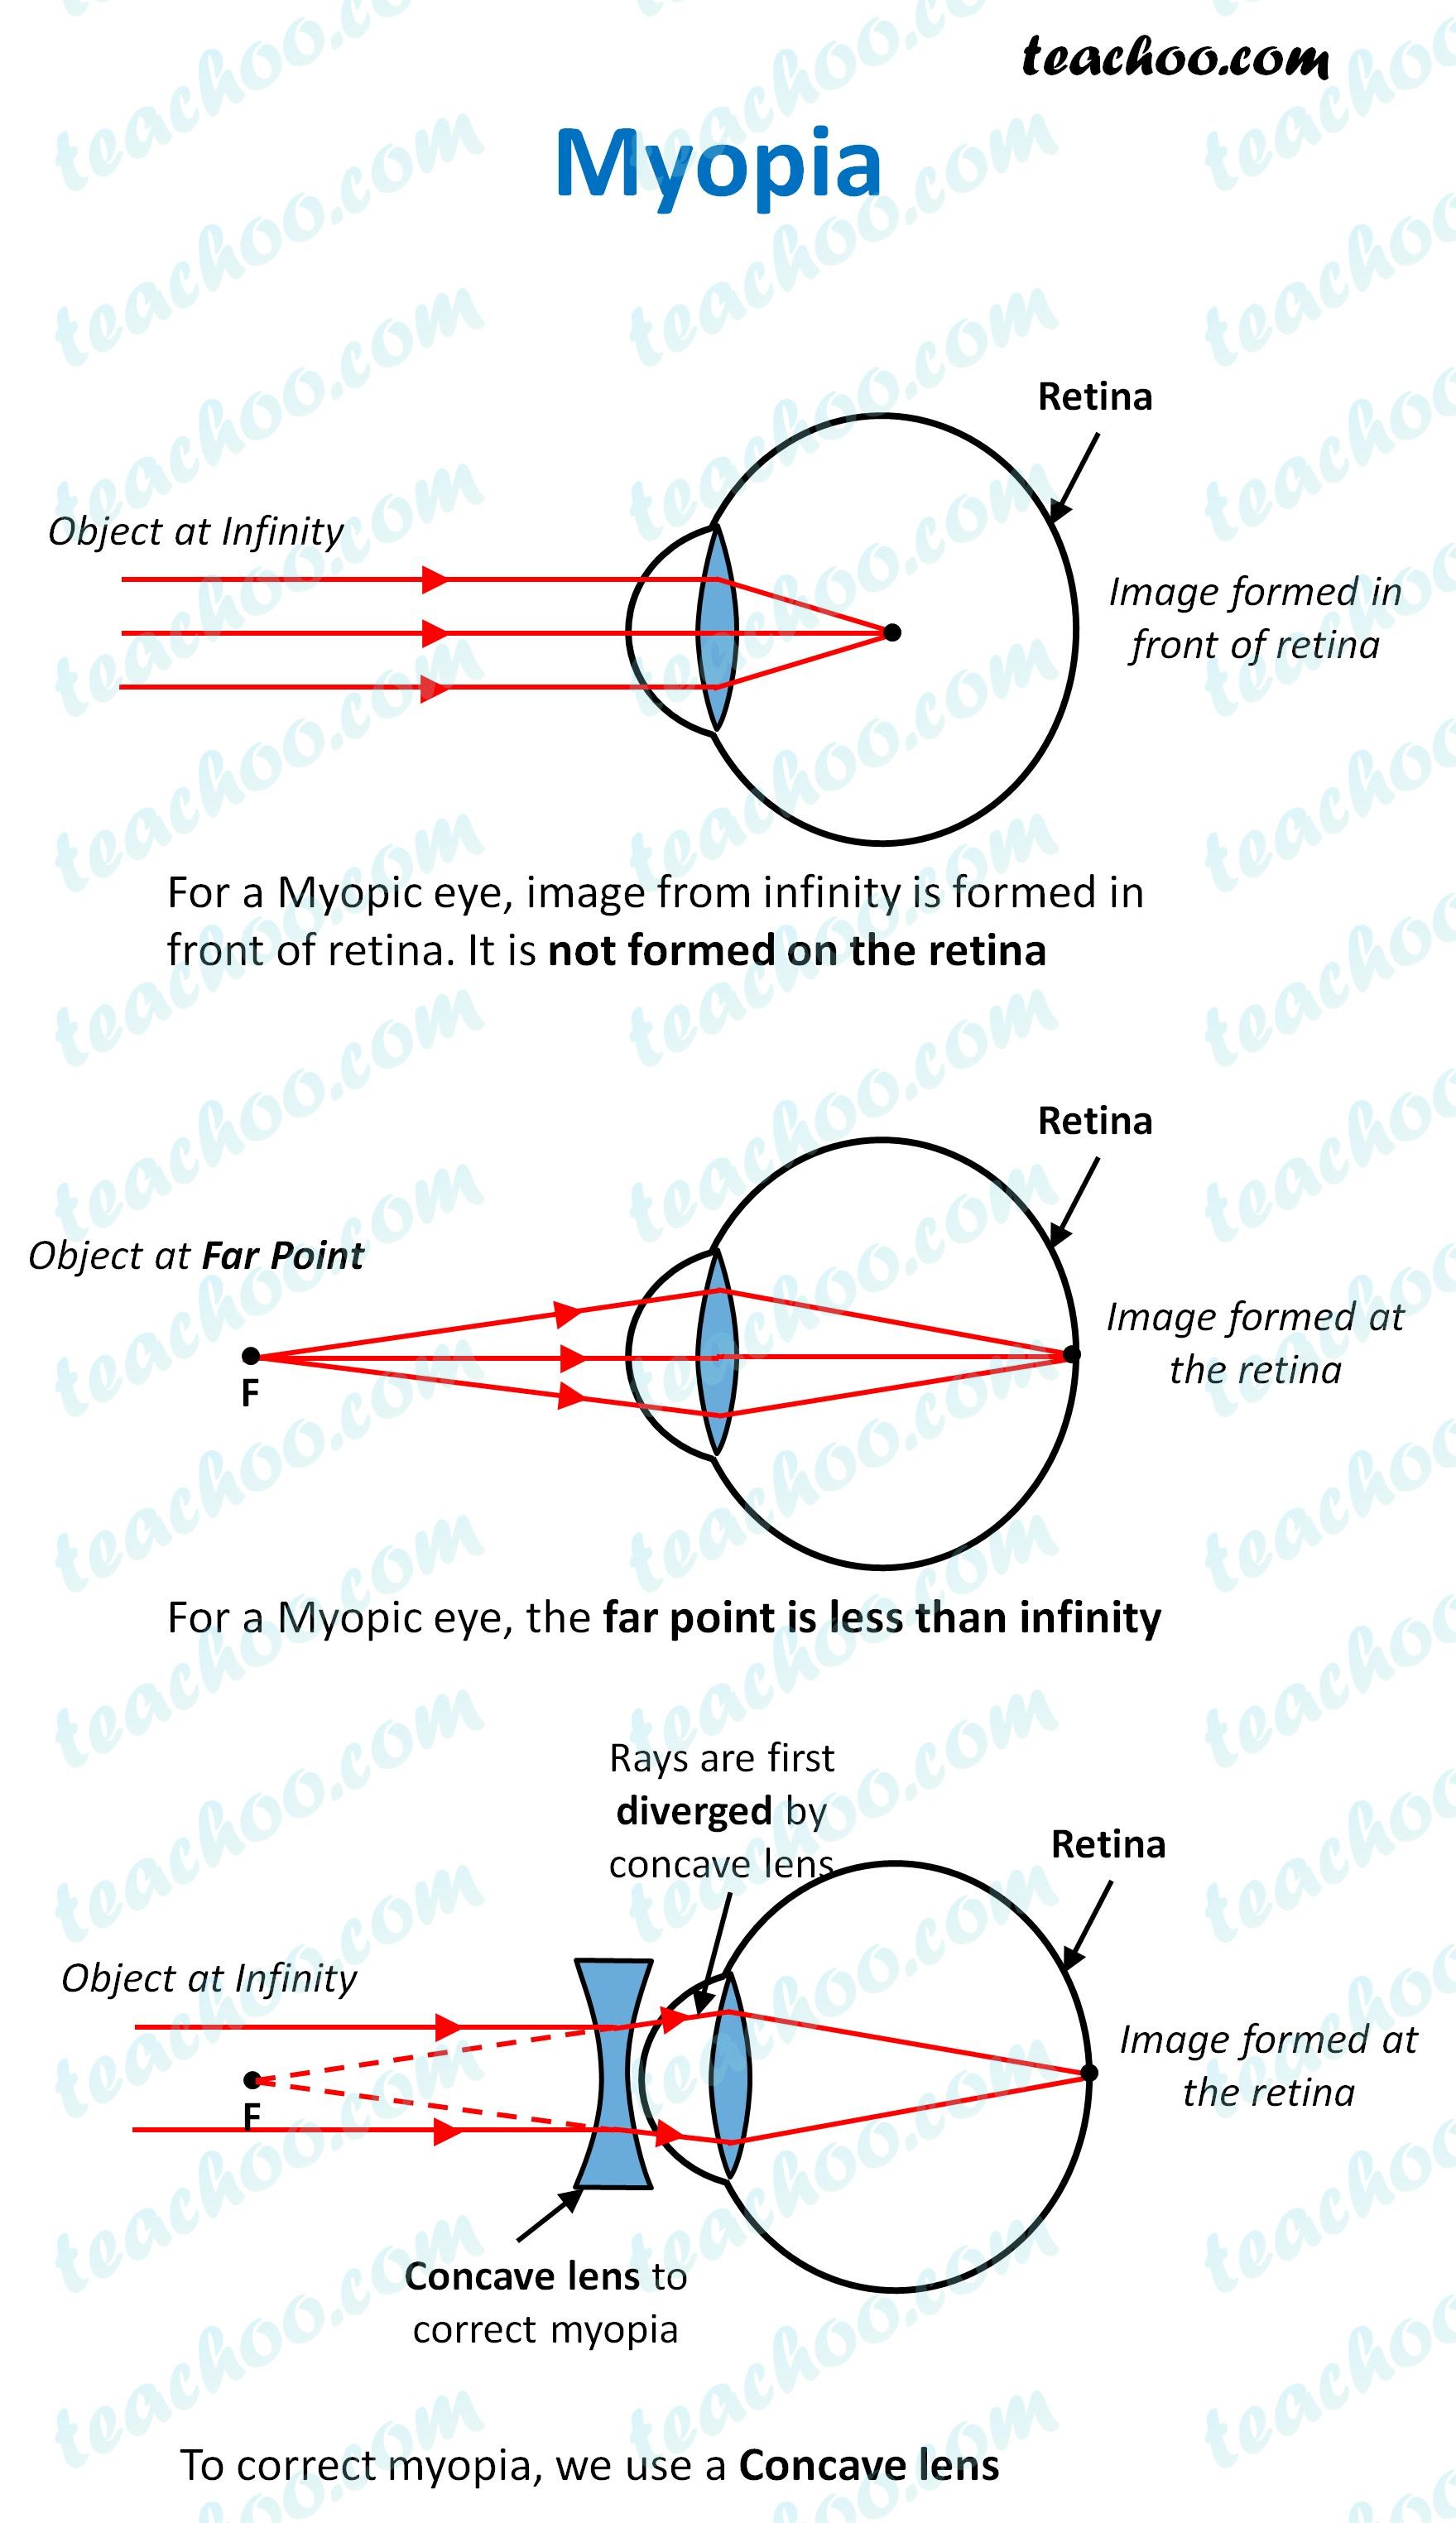 myopia---teachoo.jpg